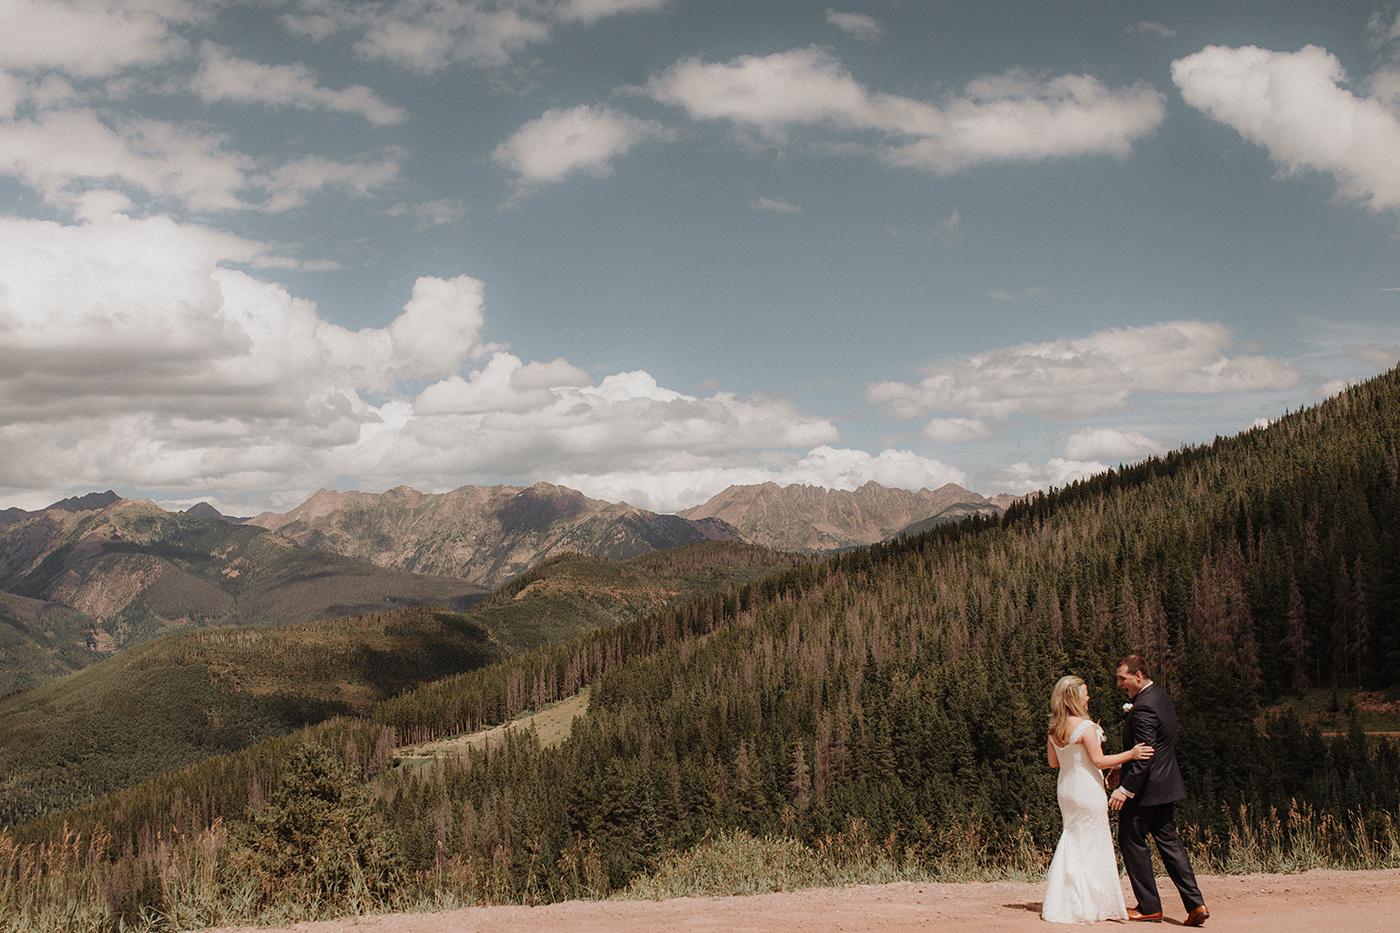 vail-colorado-wedding-photographer-mountain-top-first-look-1.jpg